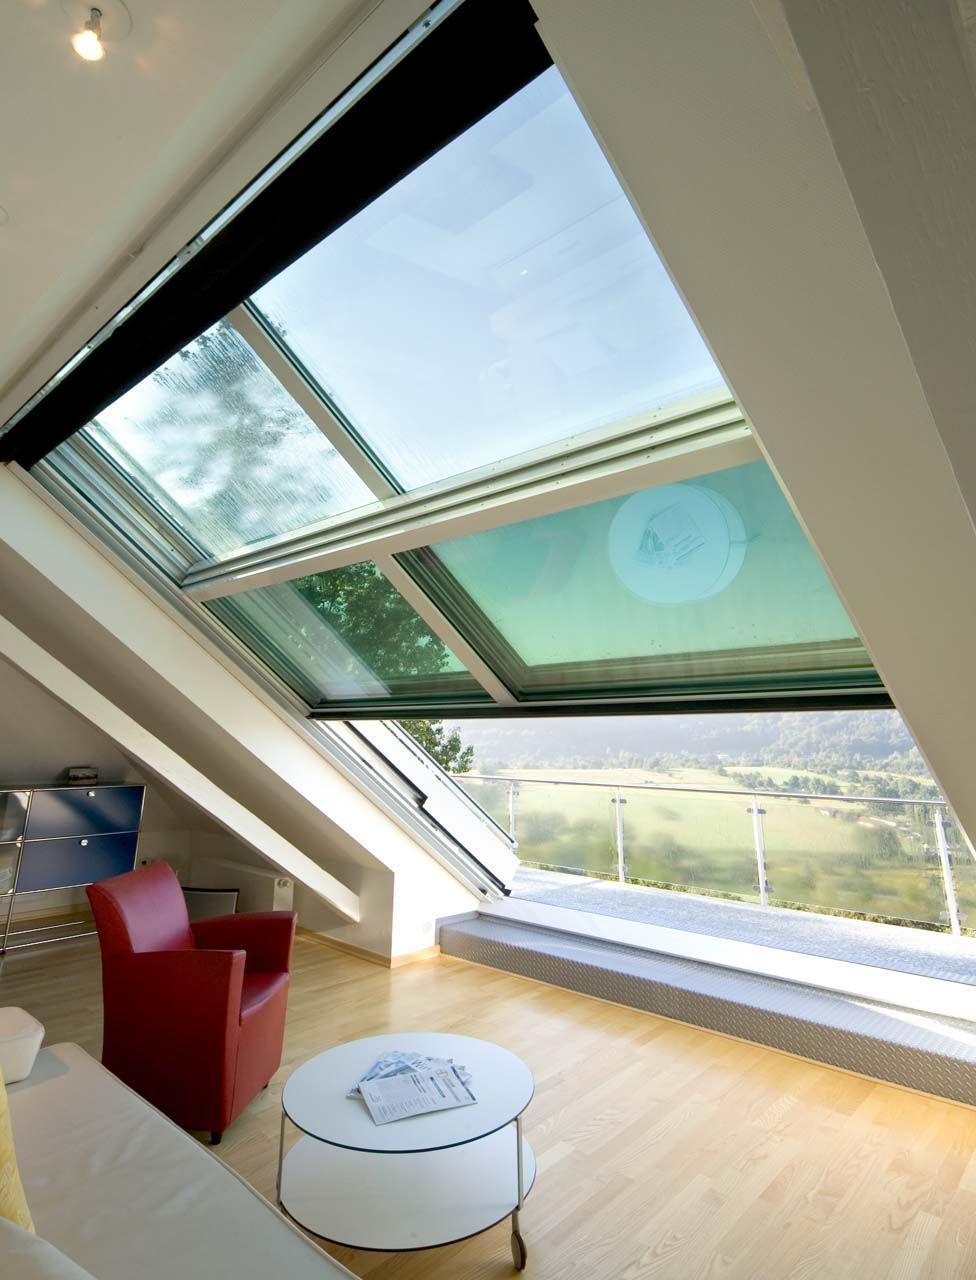 loft conversion roof sliding window openair roof window dsf openair 949 3207 sunshine. Black Bedroom Furniture Sets. Home Design Ideas